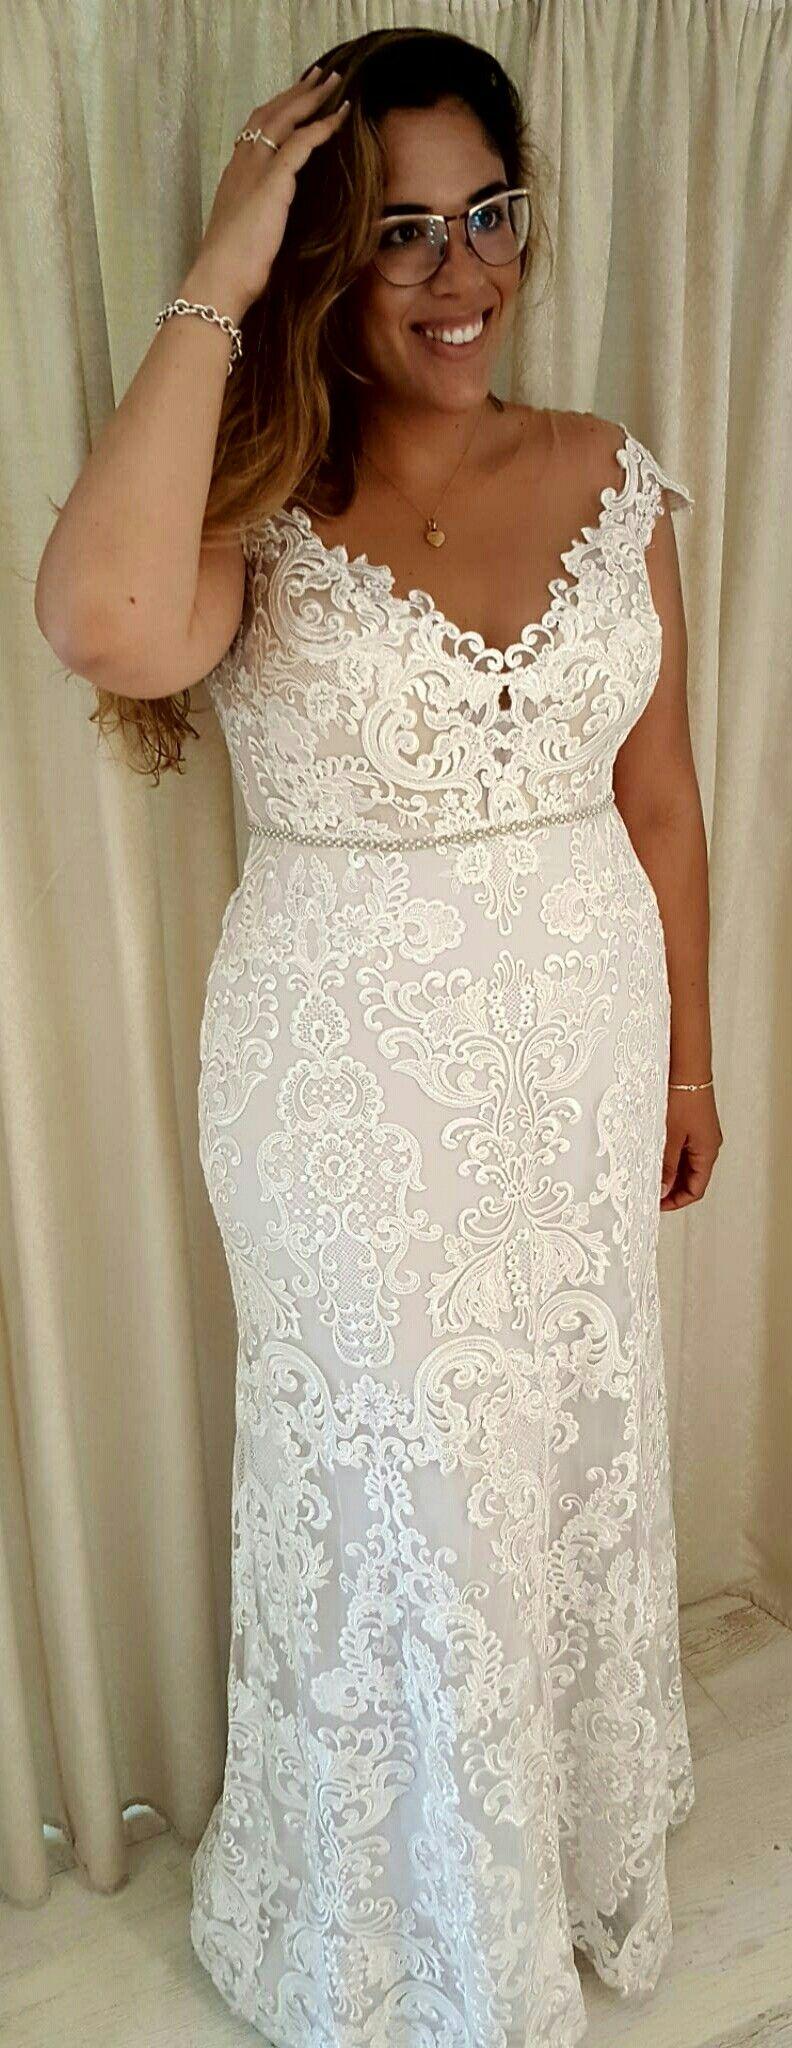 ad9dadae0c2 Plus size bride in Adel lace mermaid gown. Studio Levana. 2018 ...